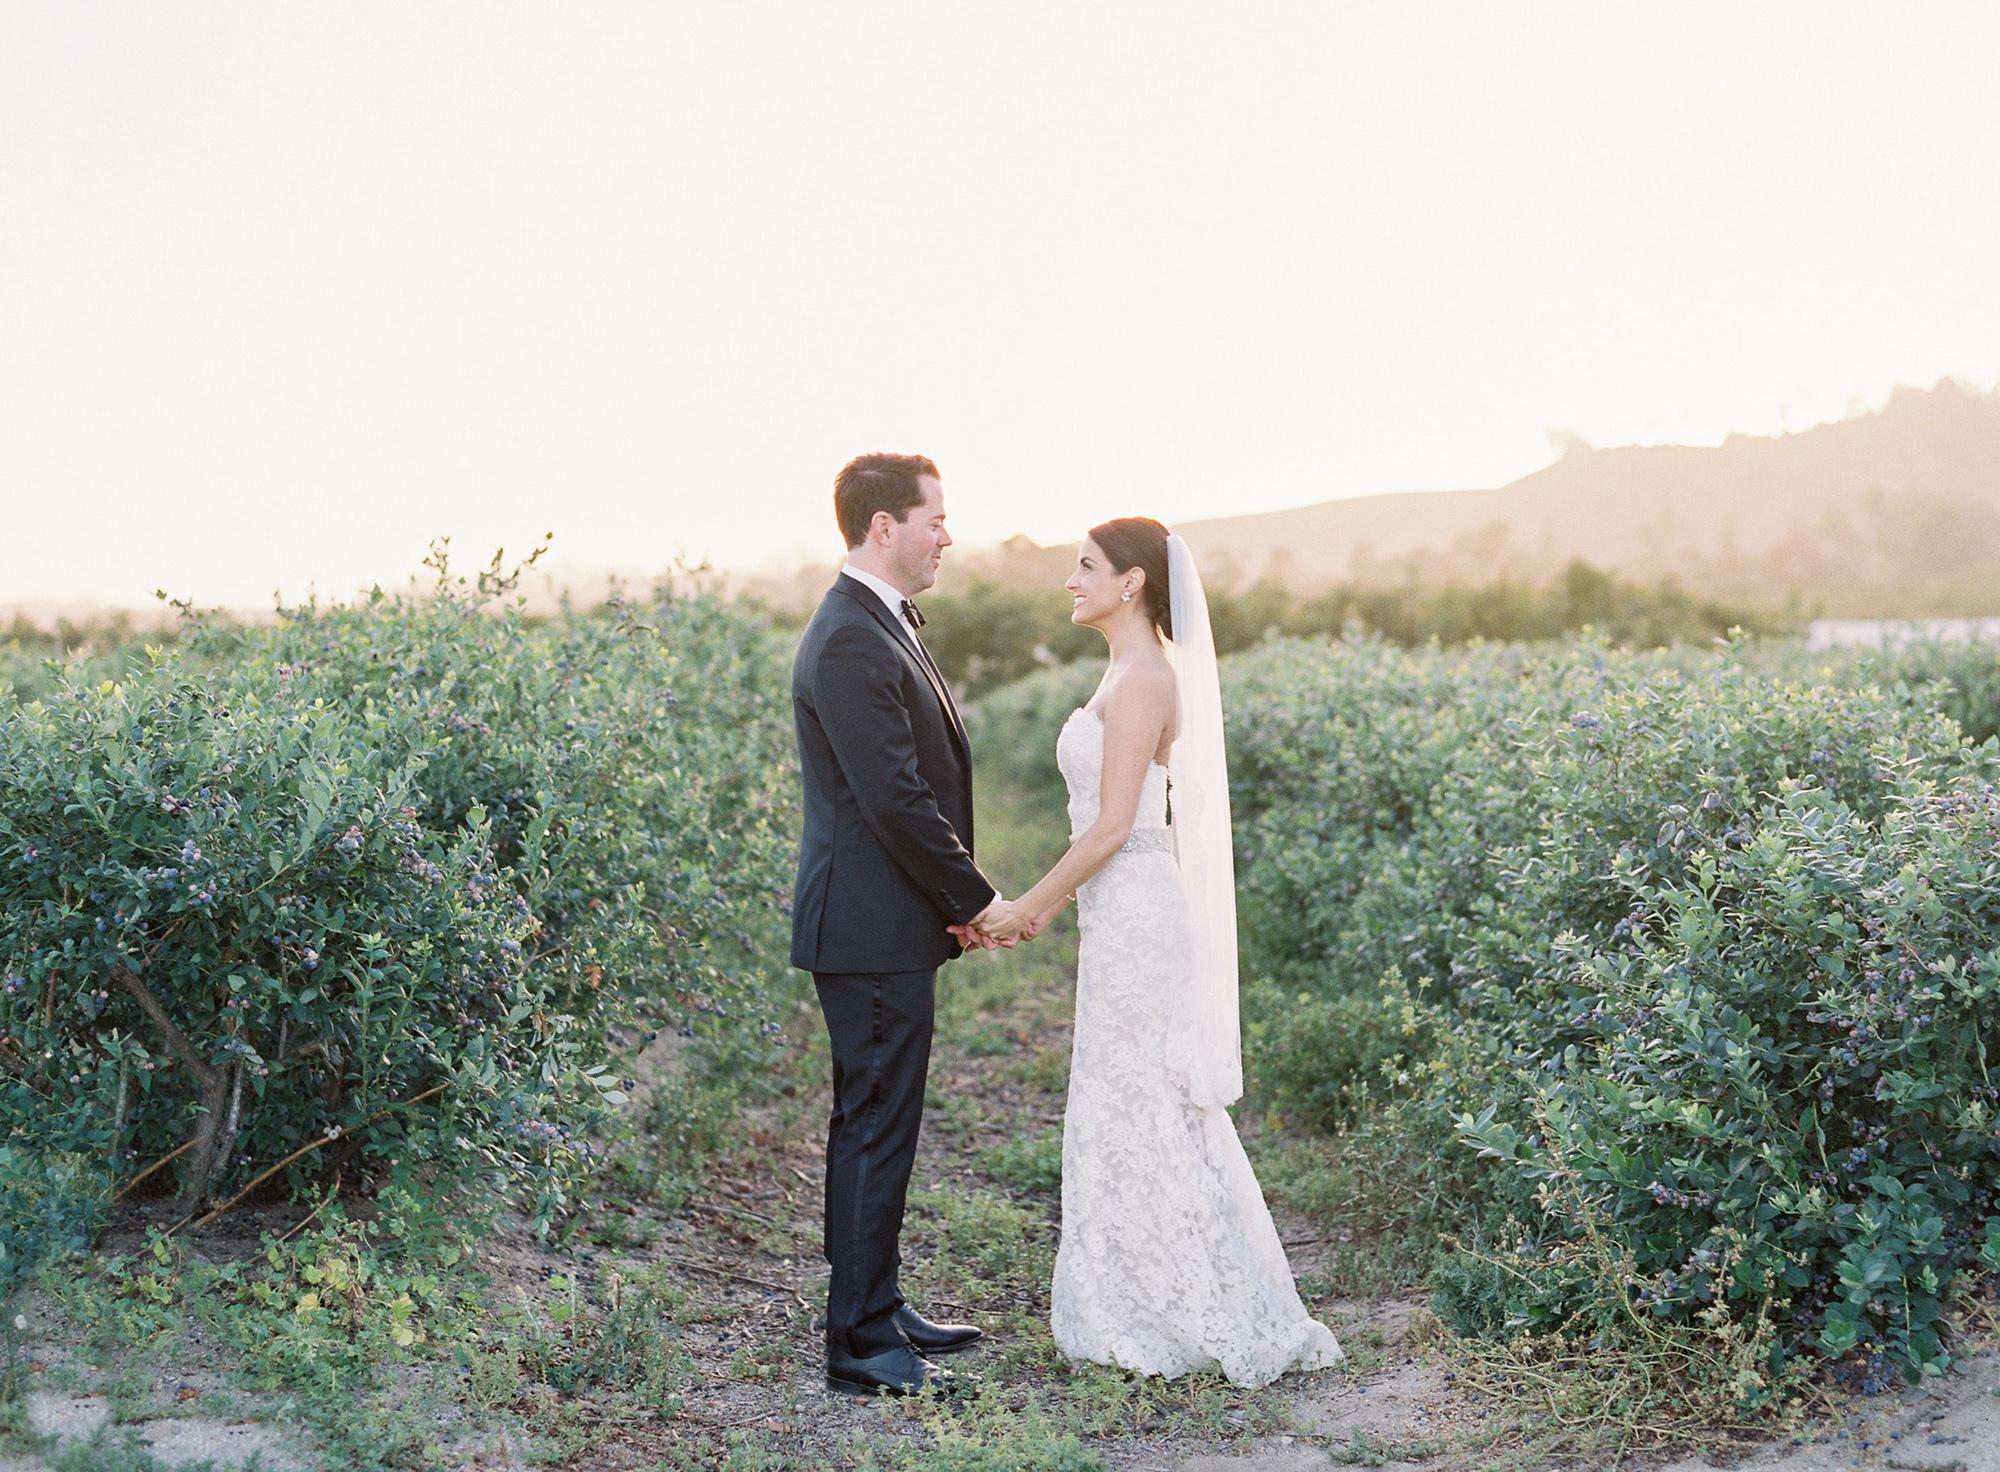 Gerry-Ranch-Wedding-Photography-Kristina-Adams-28.jpg